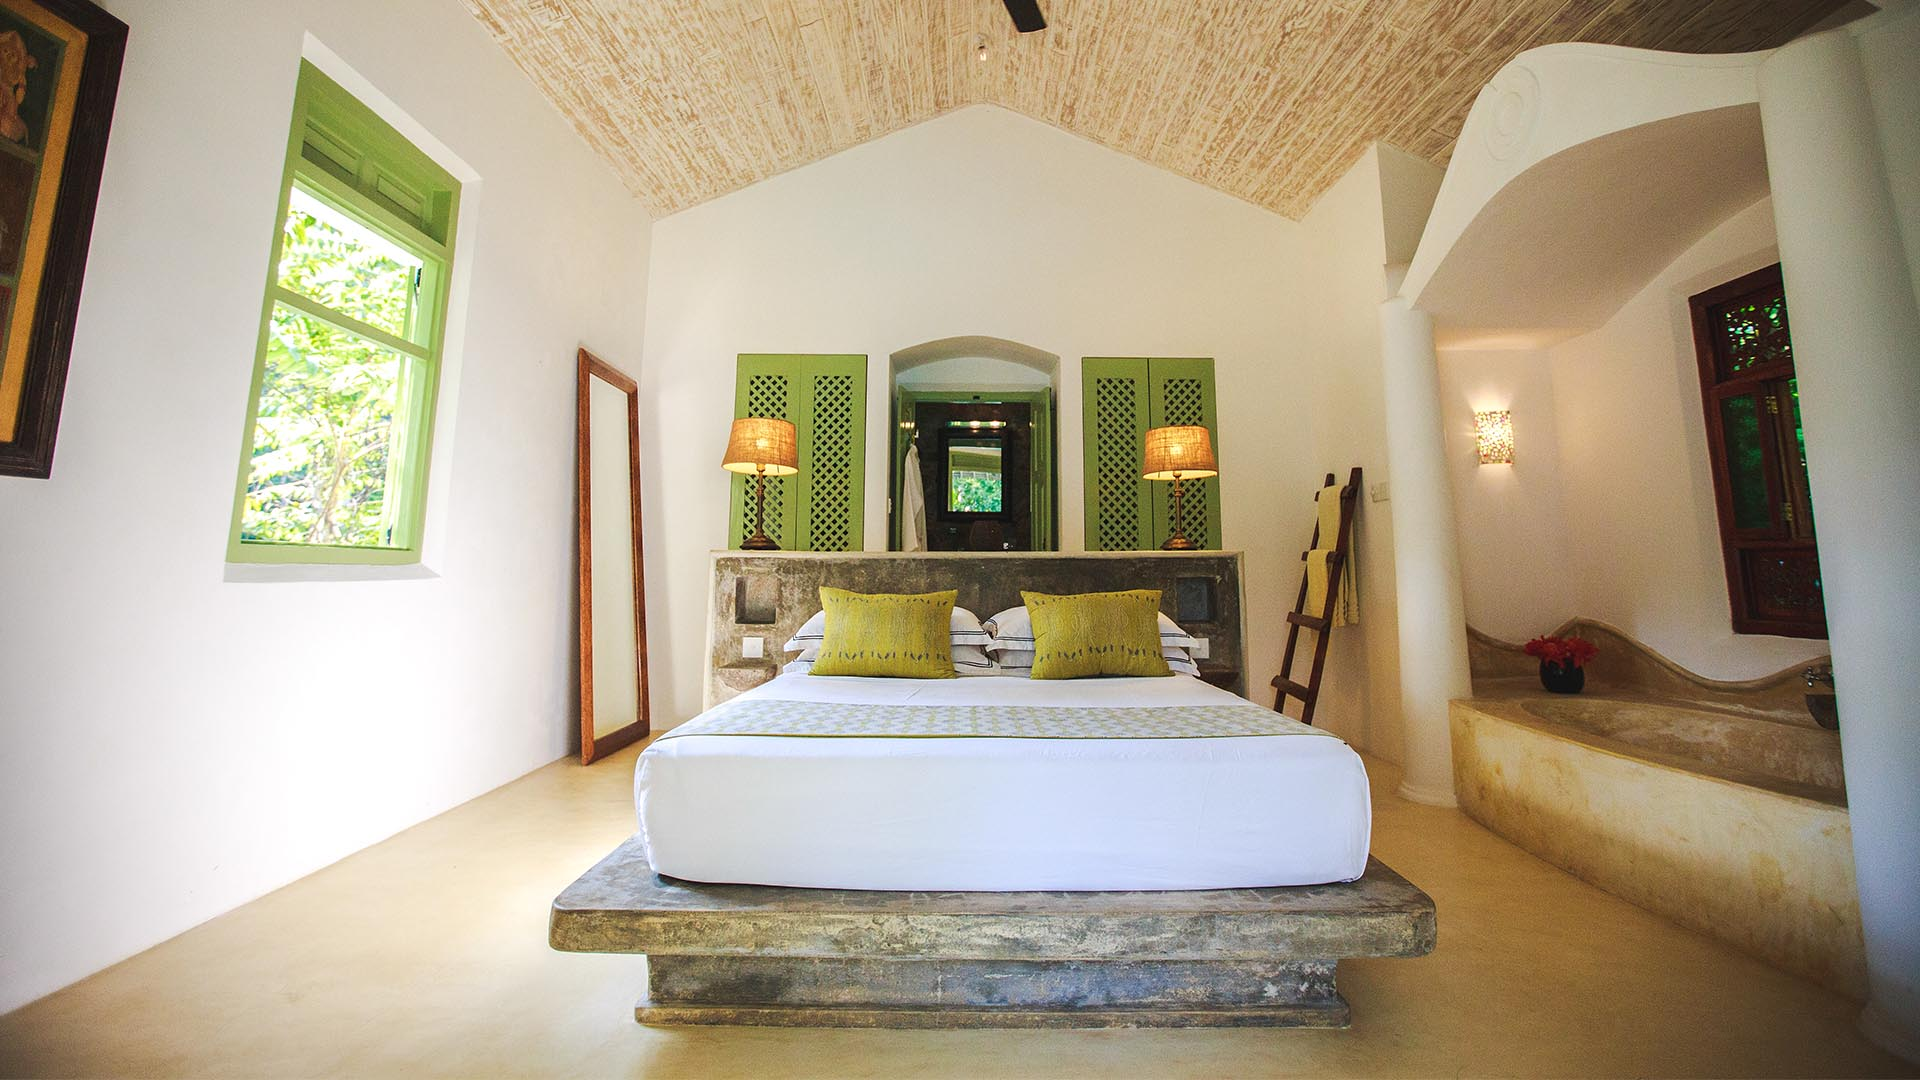 Thalduwa_villas_villa_karmel_honeymoon_suite_thalduwa_villas_villa_karmel copy.jpg